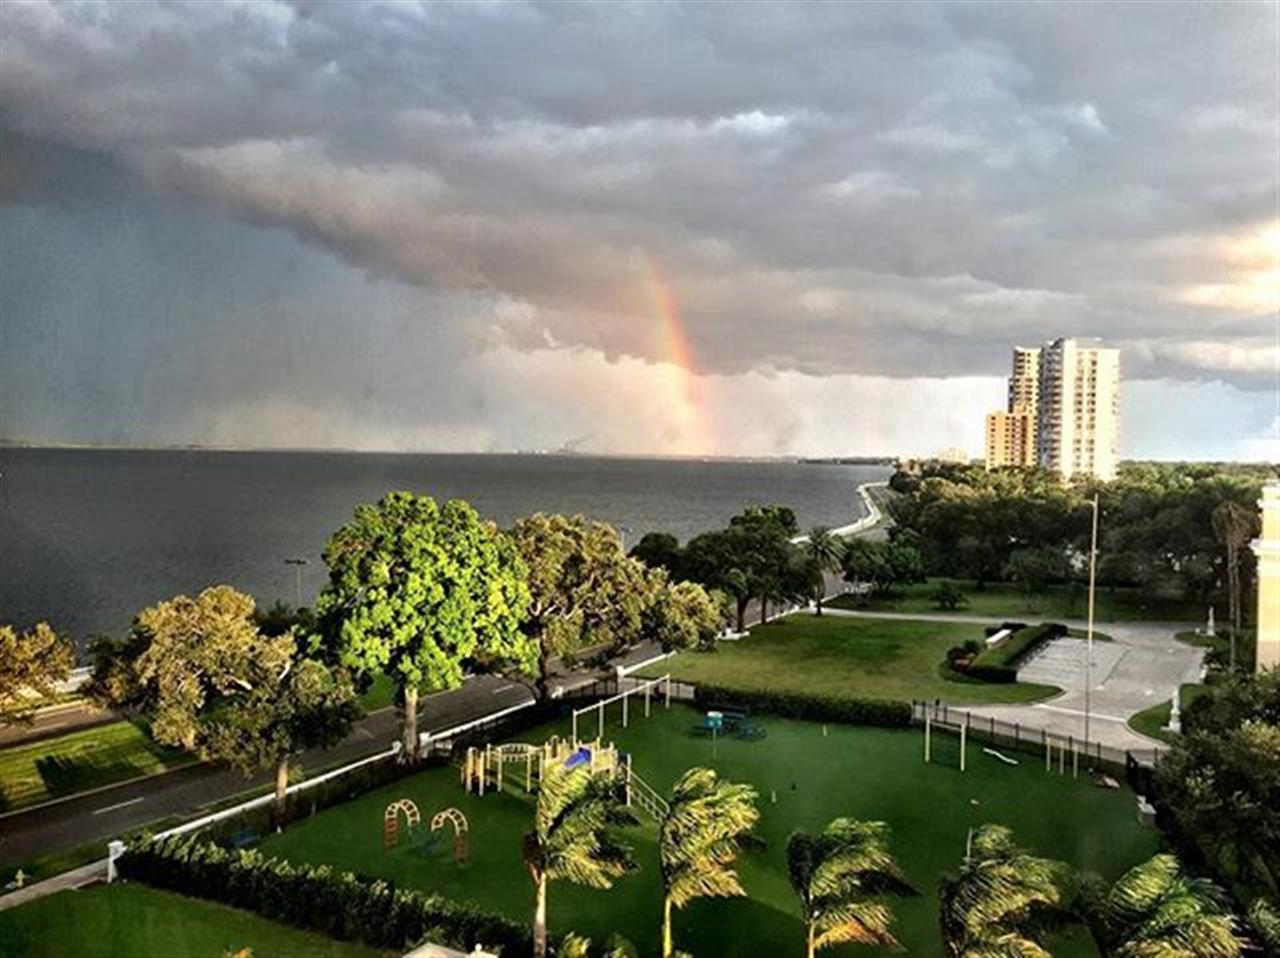 #Rainbow off #BayshoreBlvd. #tampa #tampabay #southtampa #palmaceia